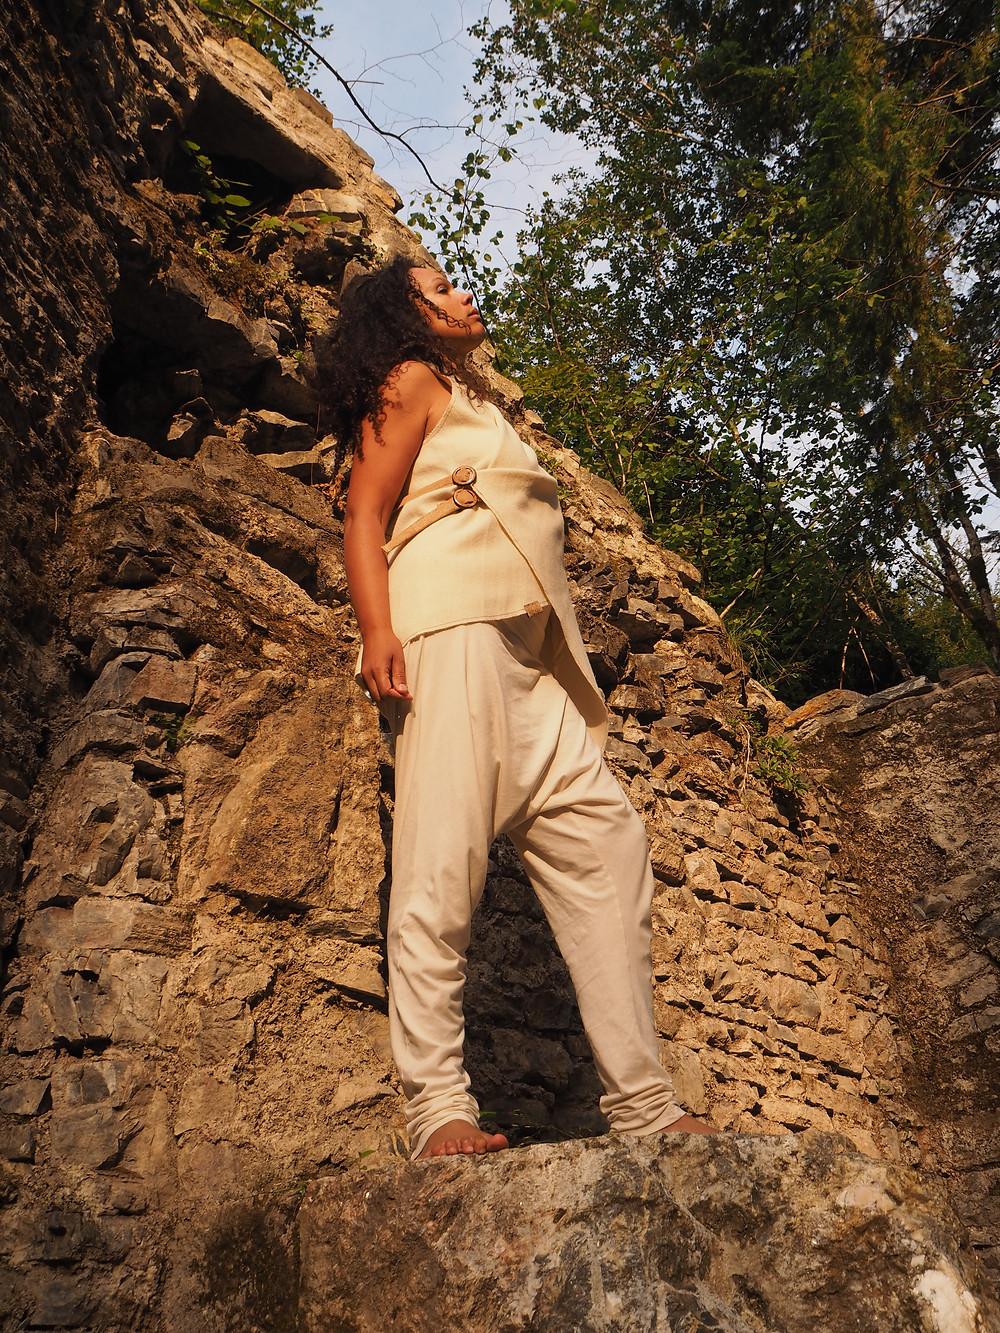 handmade wool designer vest, cork fabric, ehtic fashion, sustainable fashion, moda sostenible, lana artesana, corcho, yoga wear, ecoglam, ecofashion, bindu spiritual fashion, #fashionbindu